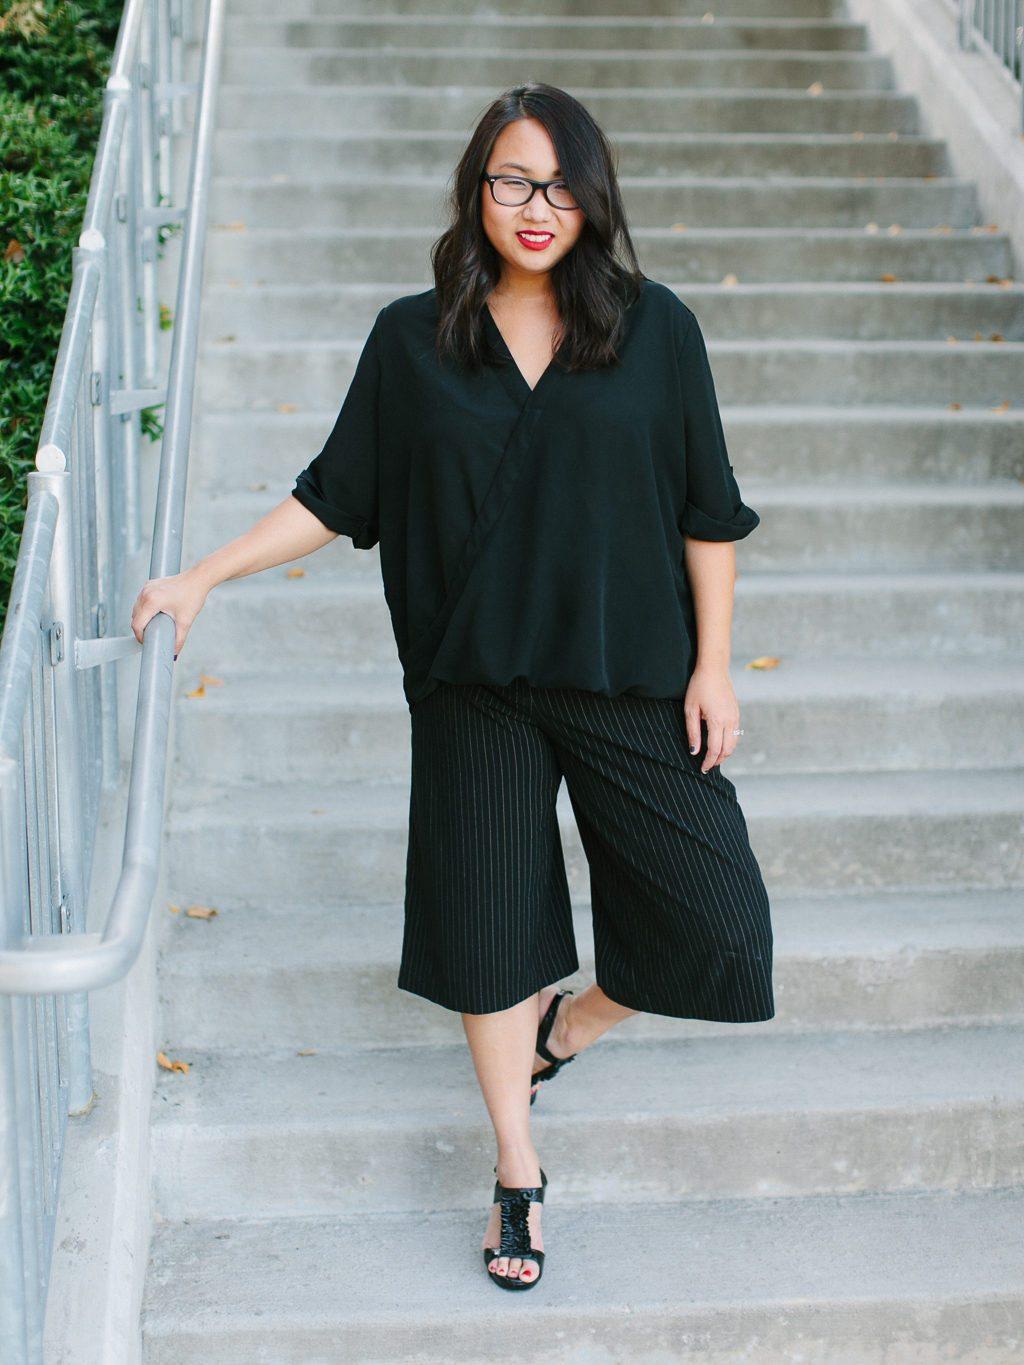 $20 Thrift Store Challenge | Stephanie Drenka